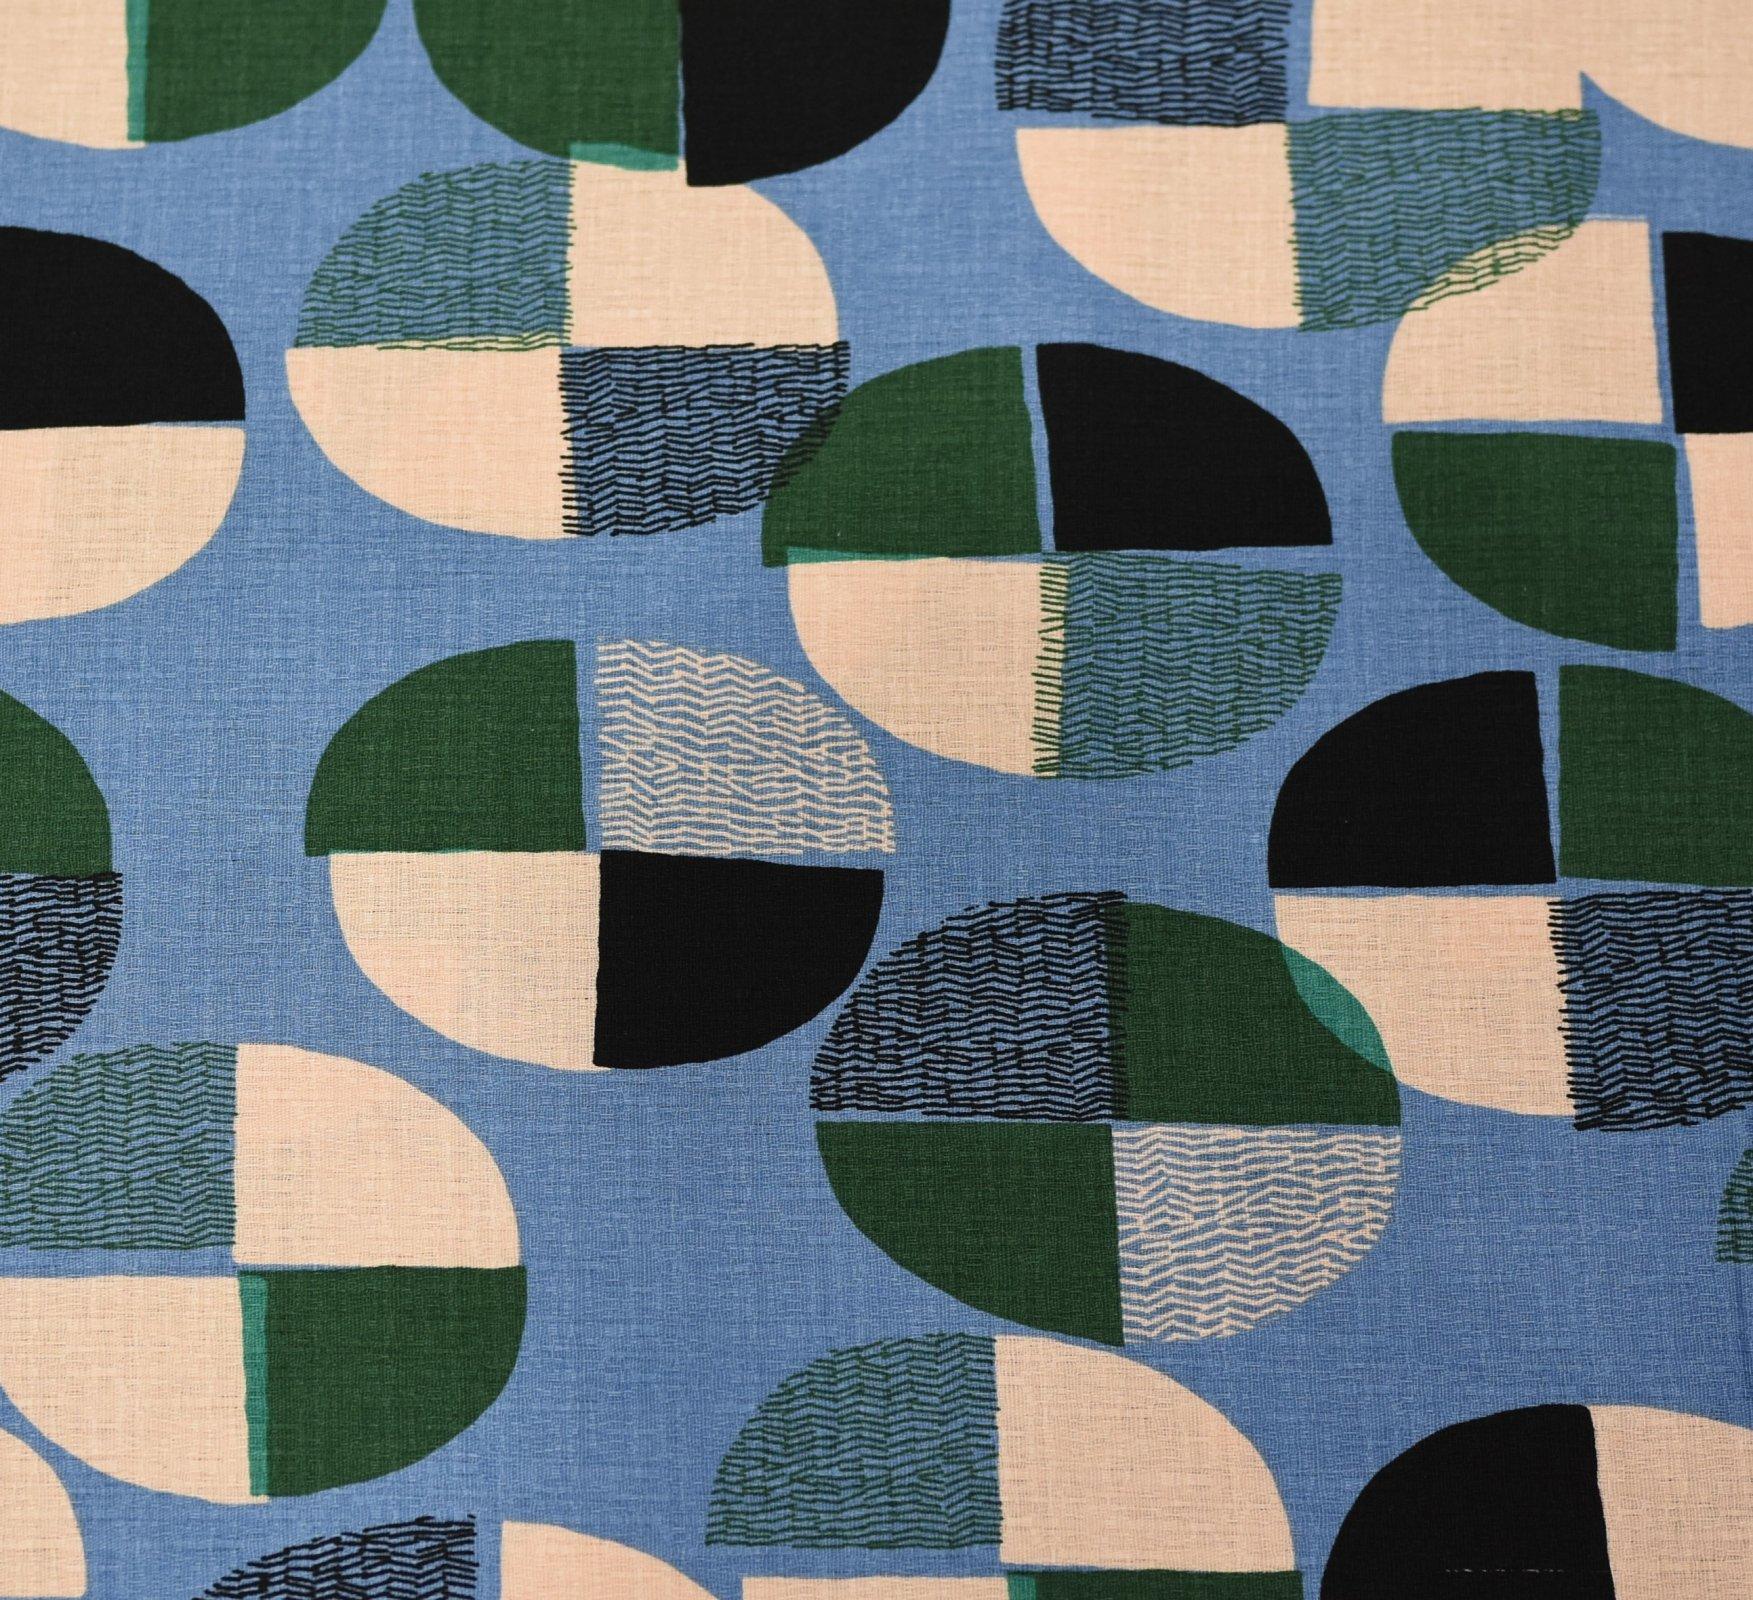 Hokkoh Fabric - Deconstructed Spot - Blue & Green